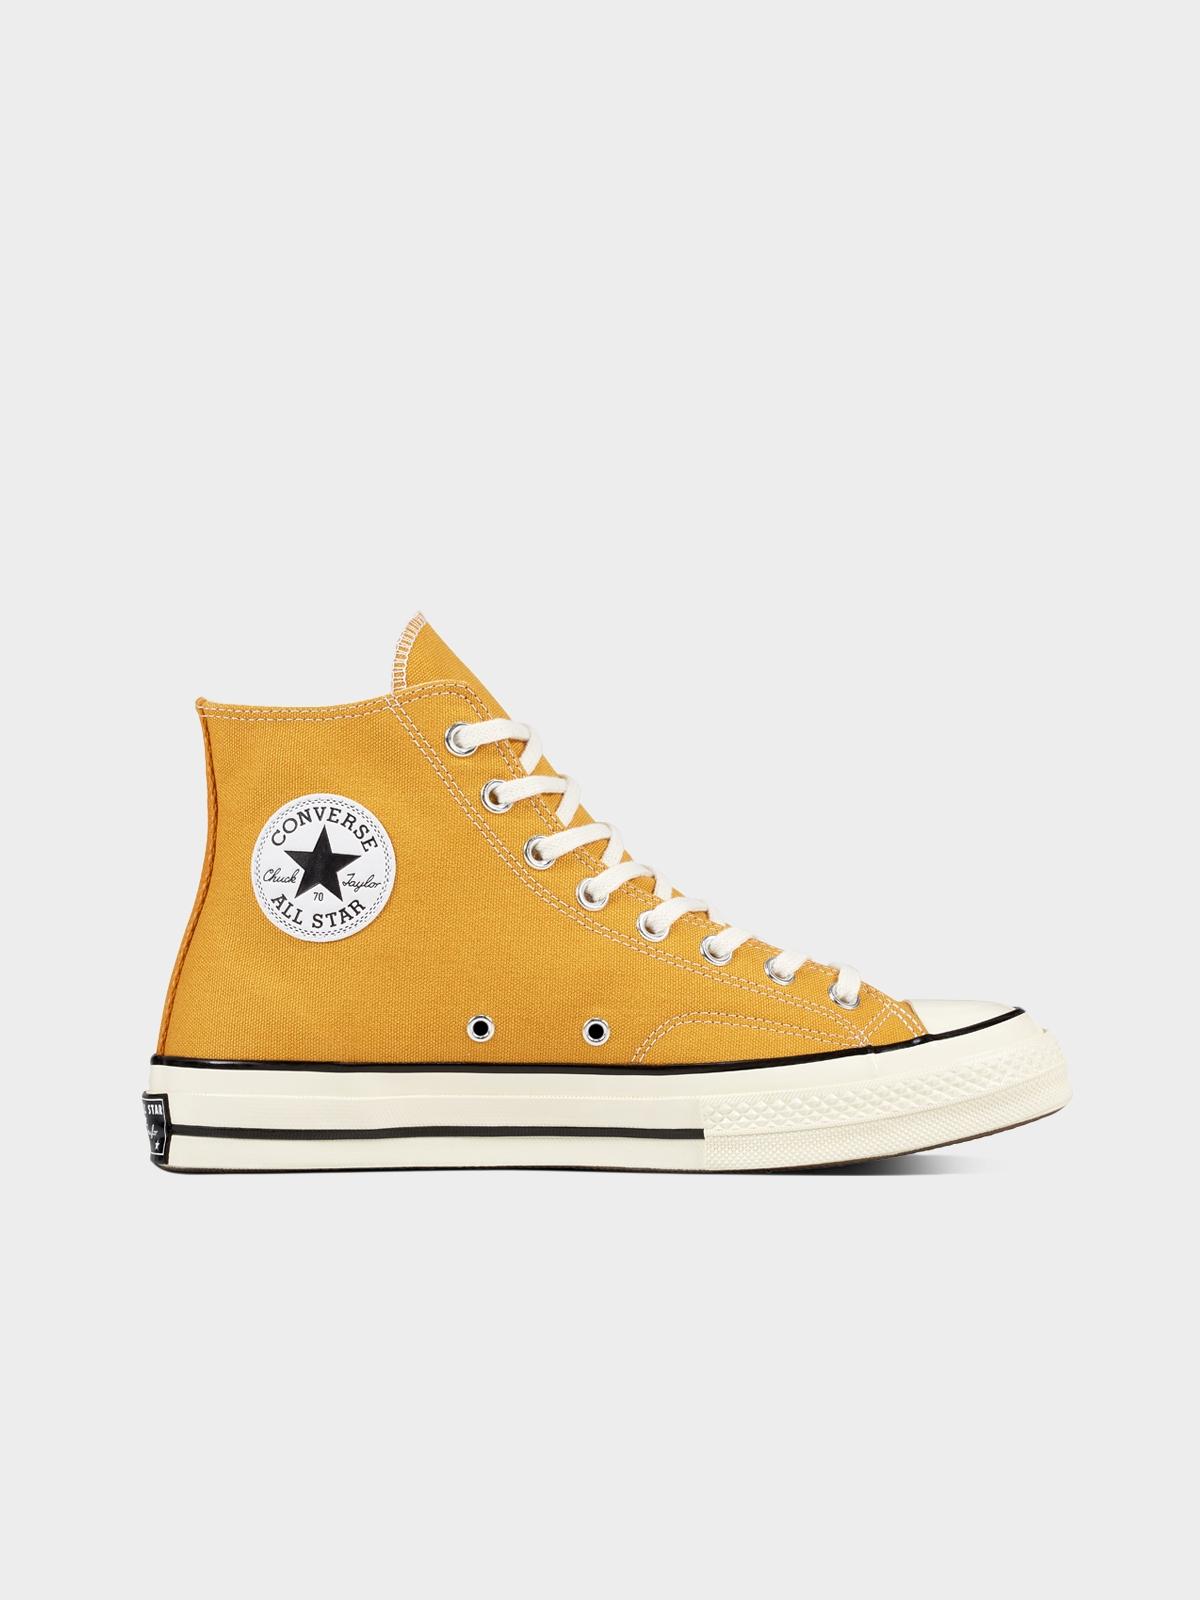 Converse All Star 70 Hi Sunflower Sneakers Mustard